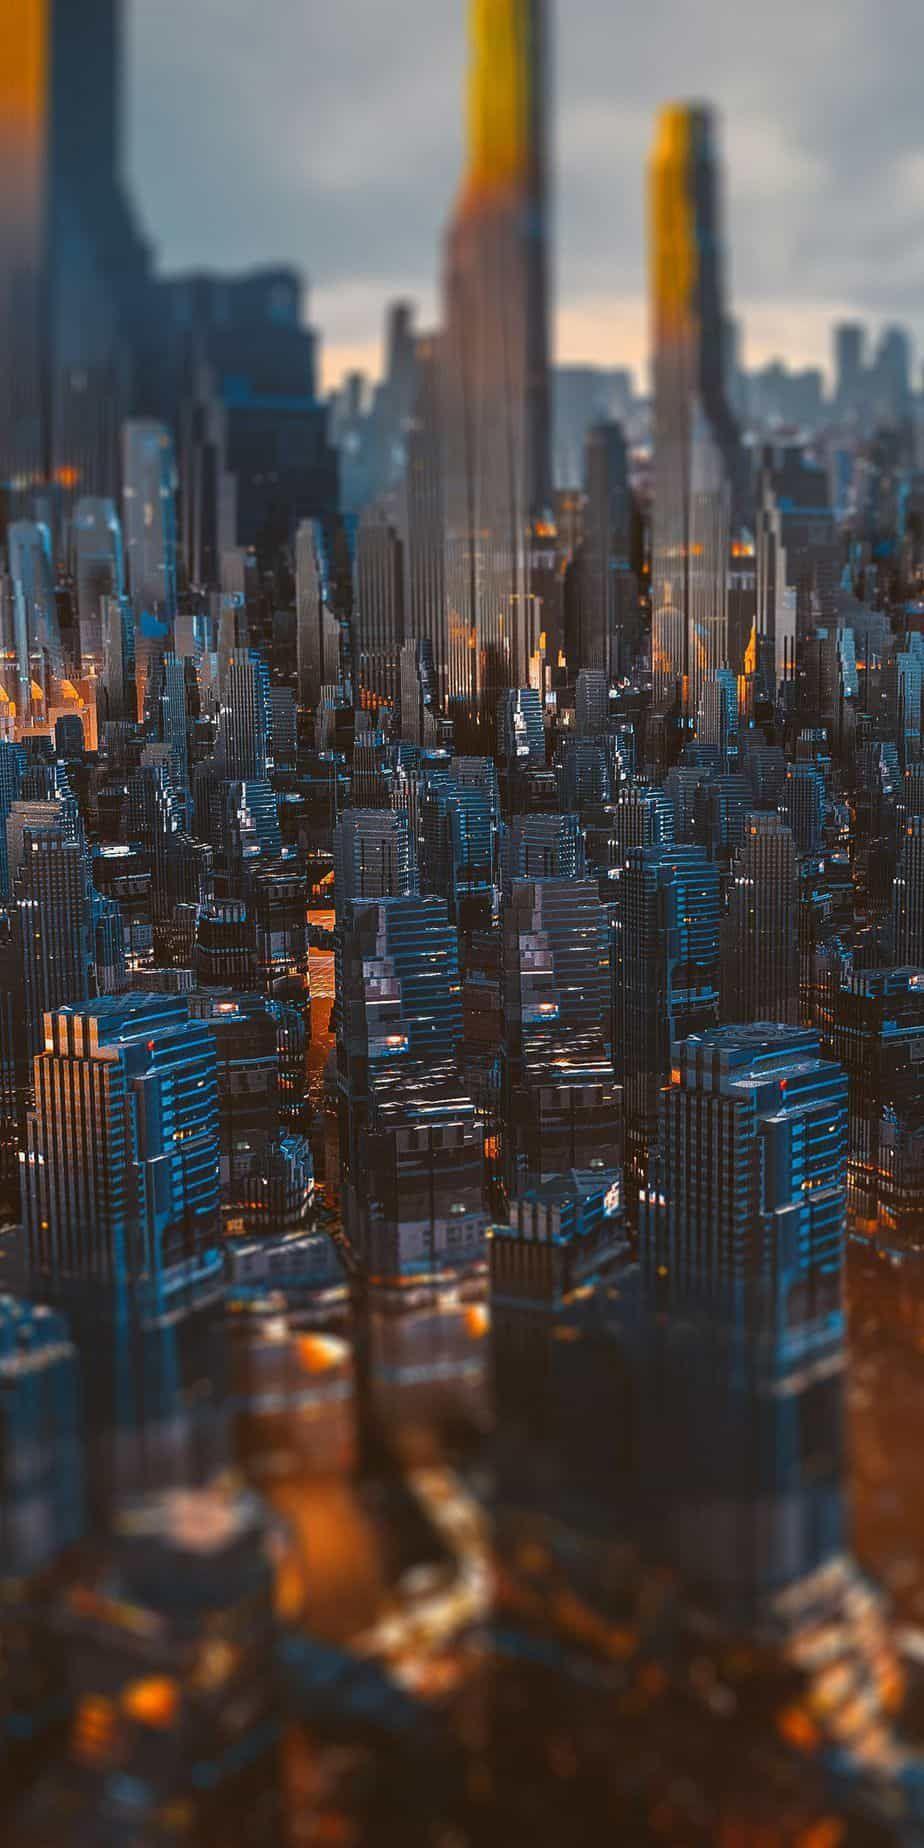 iPhone XR Wallpaper 402 4K HD Download Free HD Wallpaper